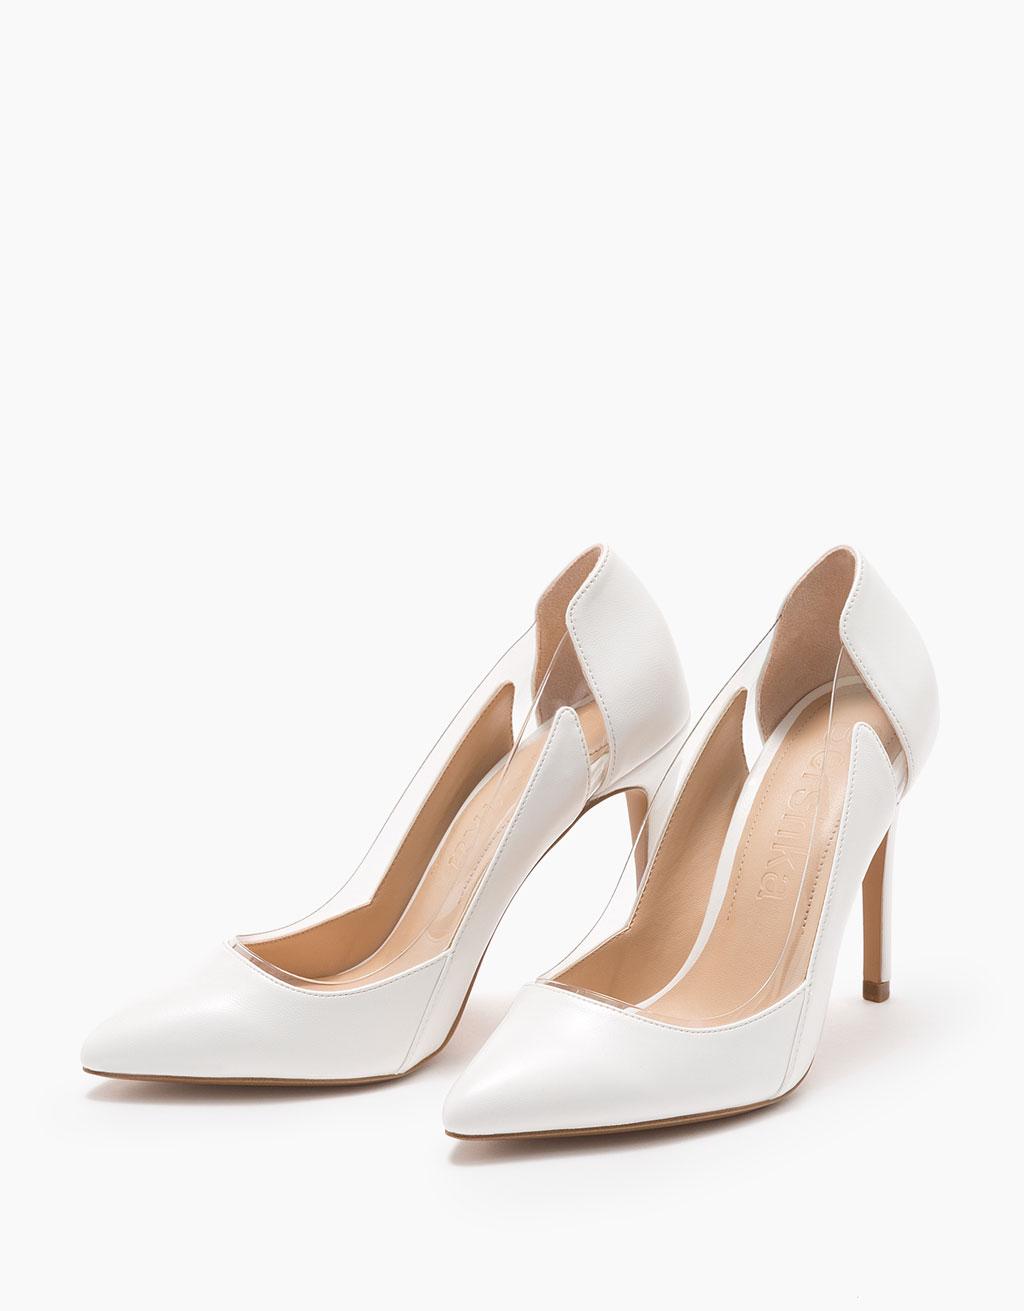 tout voir chaussures femme bershka france. Black Bedroom Furniture Sets. Home Design Ideas